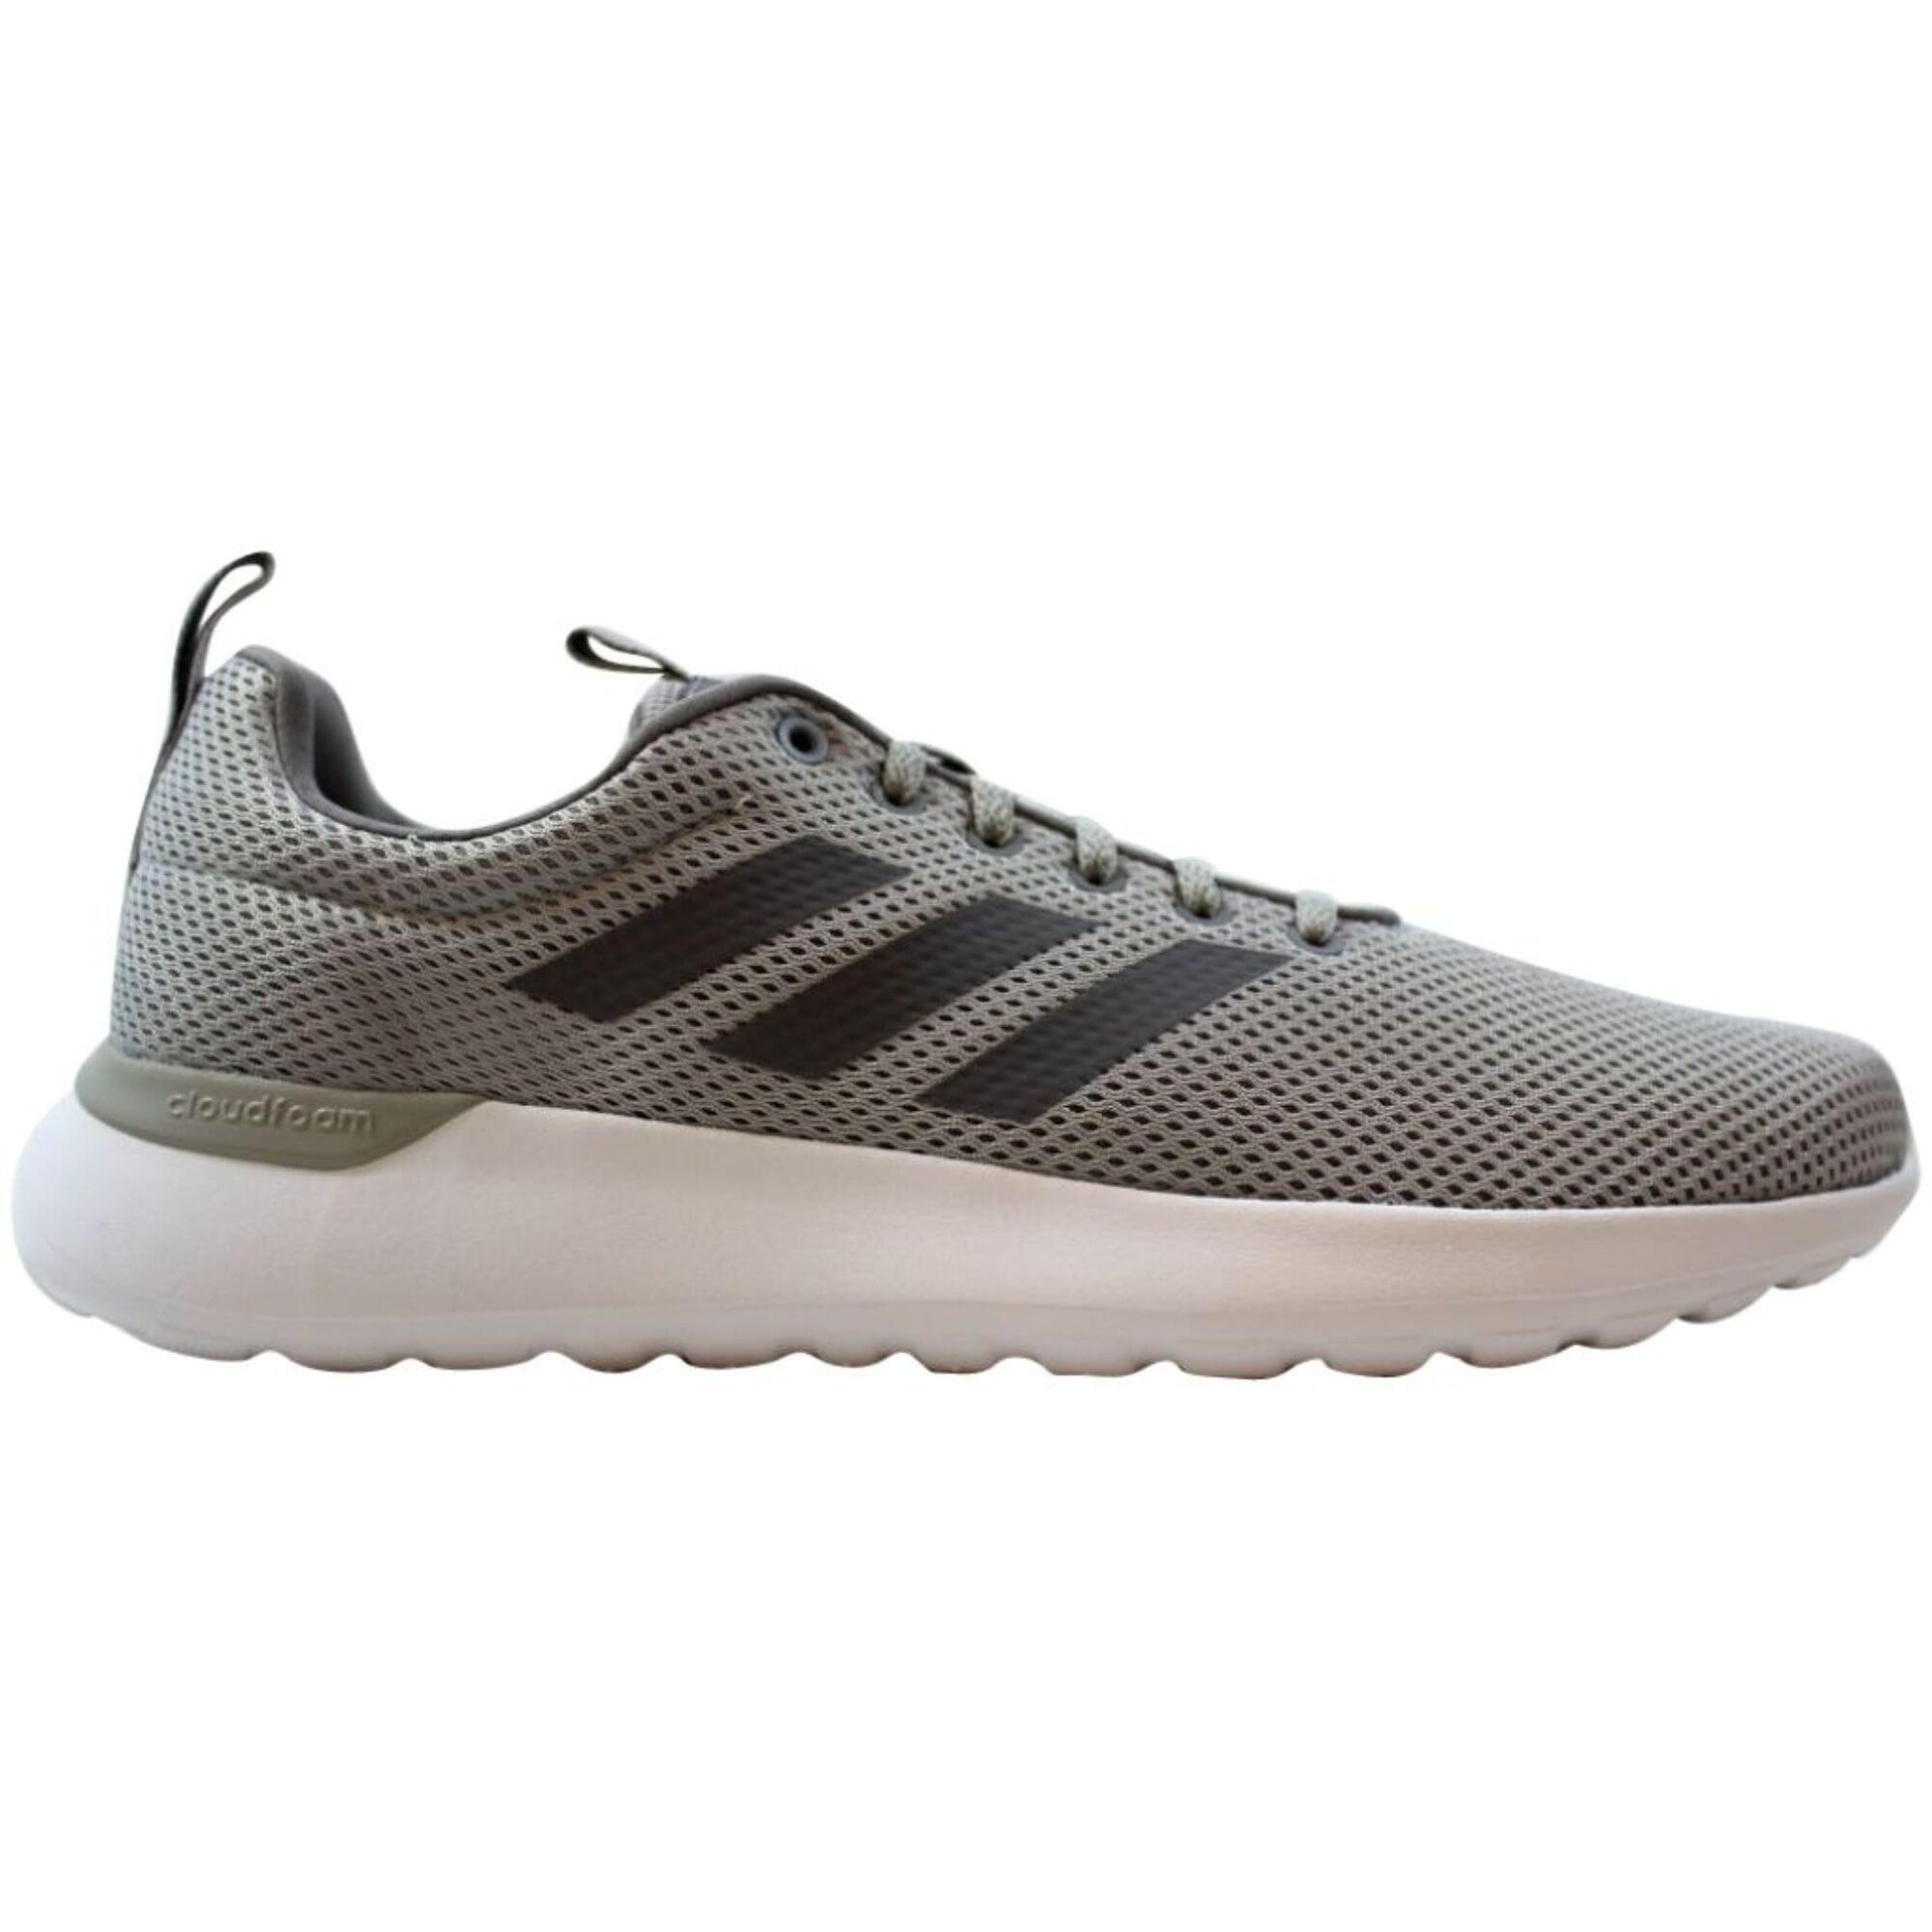 Adidas Lite Racer Cloudfoam Grey/White EE8134 Men's